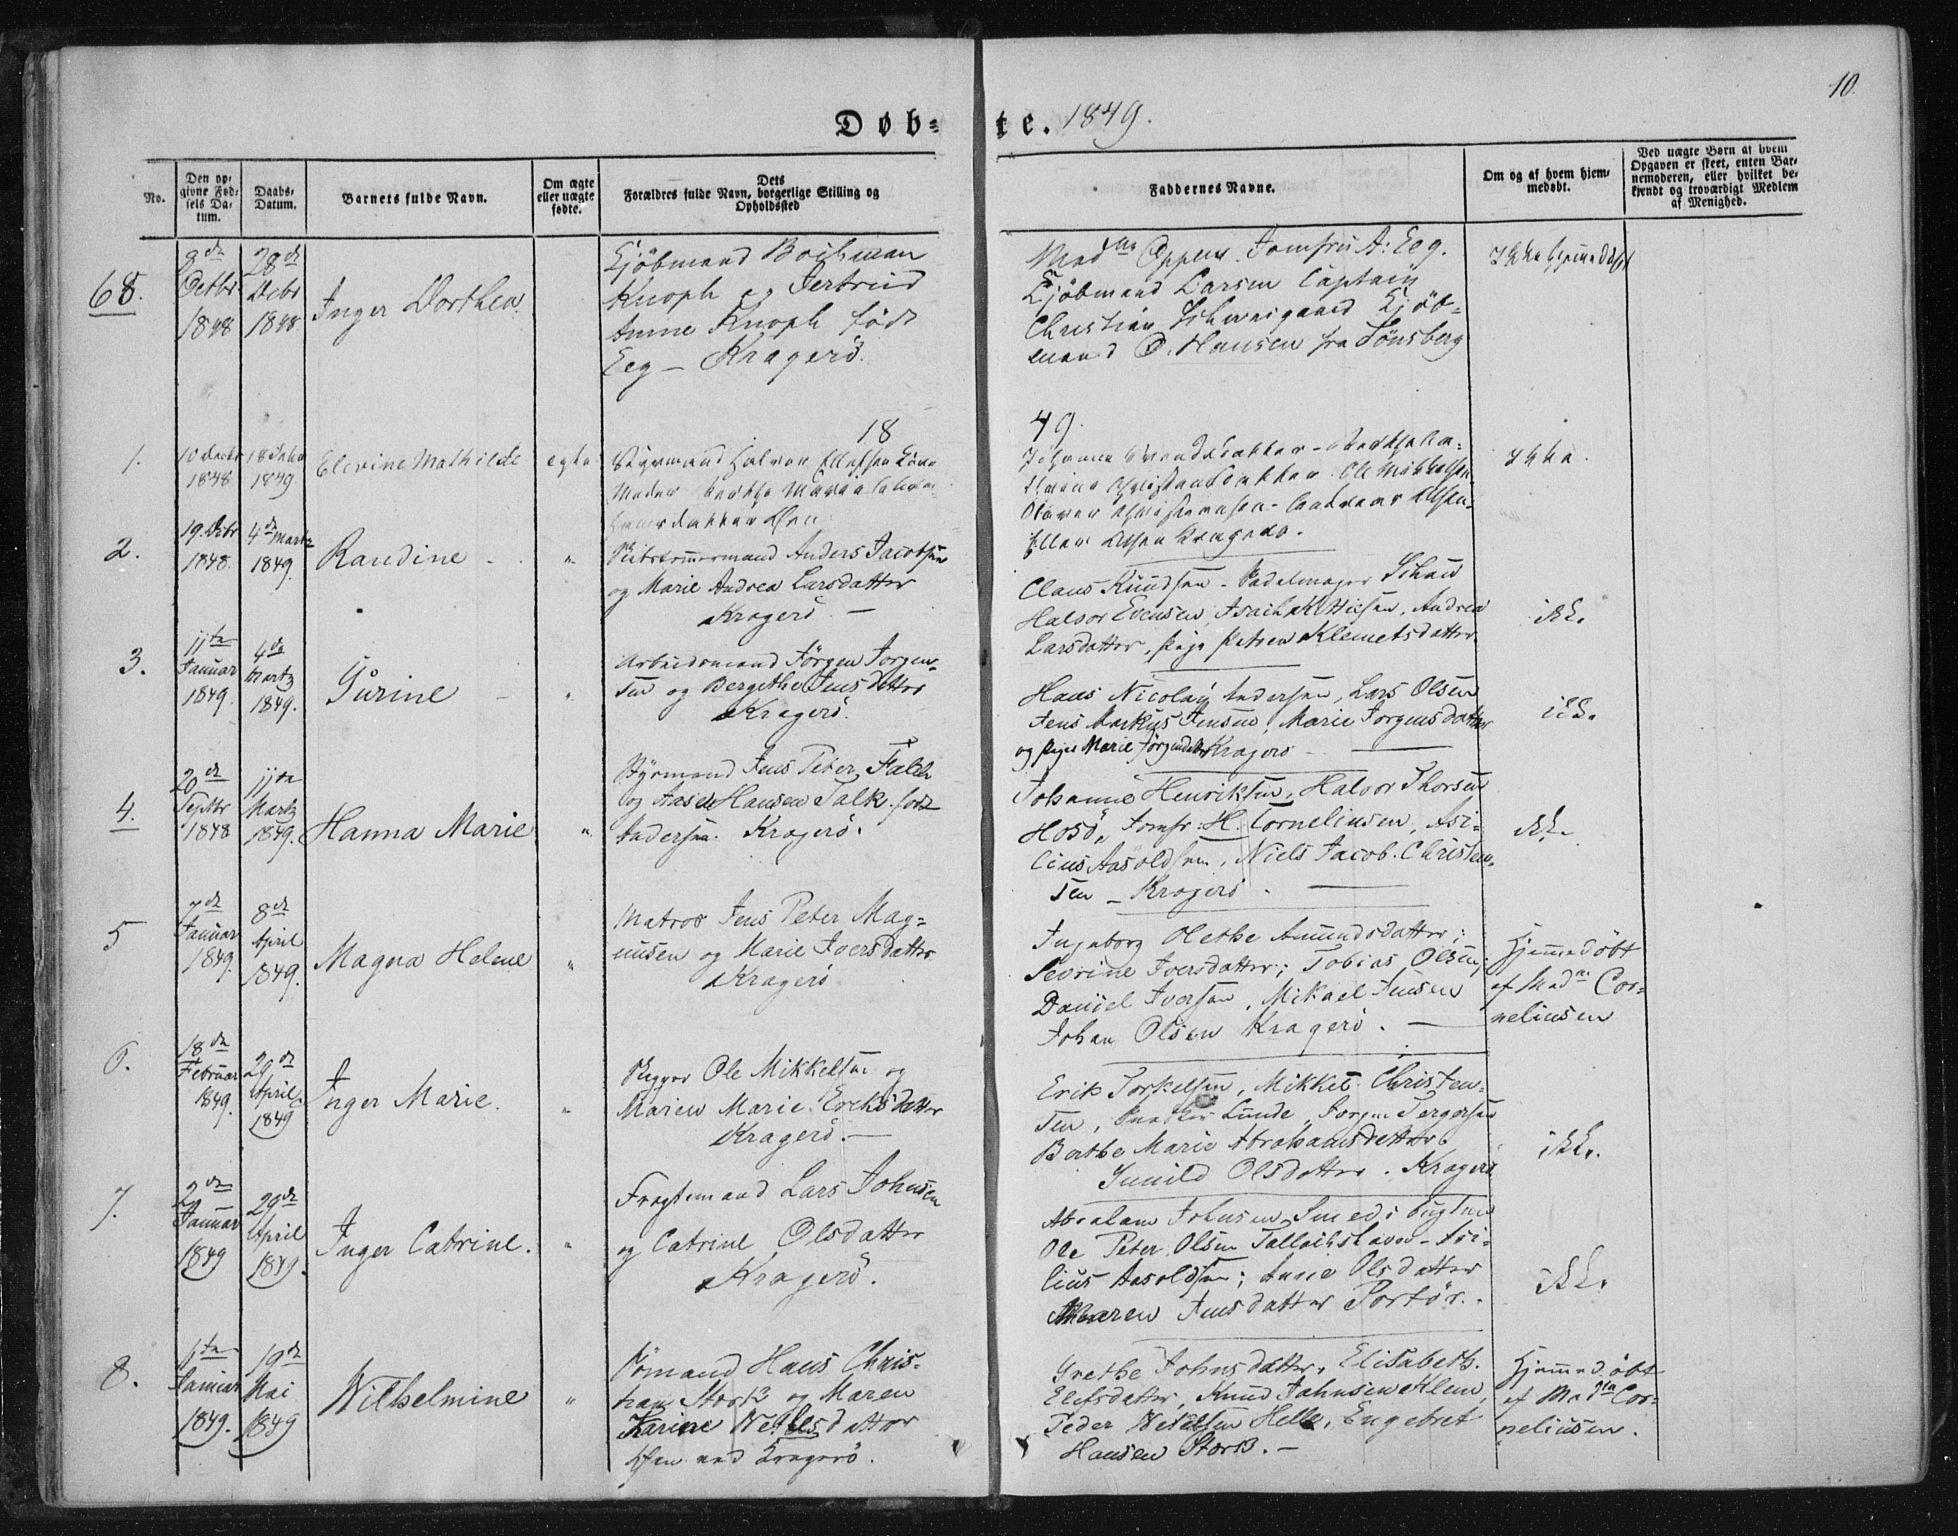 SAKO, Kragerø kirkebøker, F/Fa/L0006: Ministerialbok nr. 6, 1847-1861, s. 10